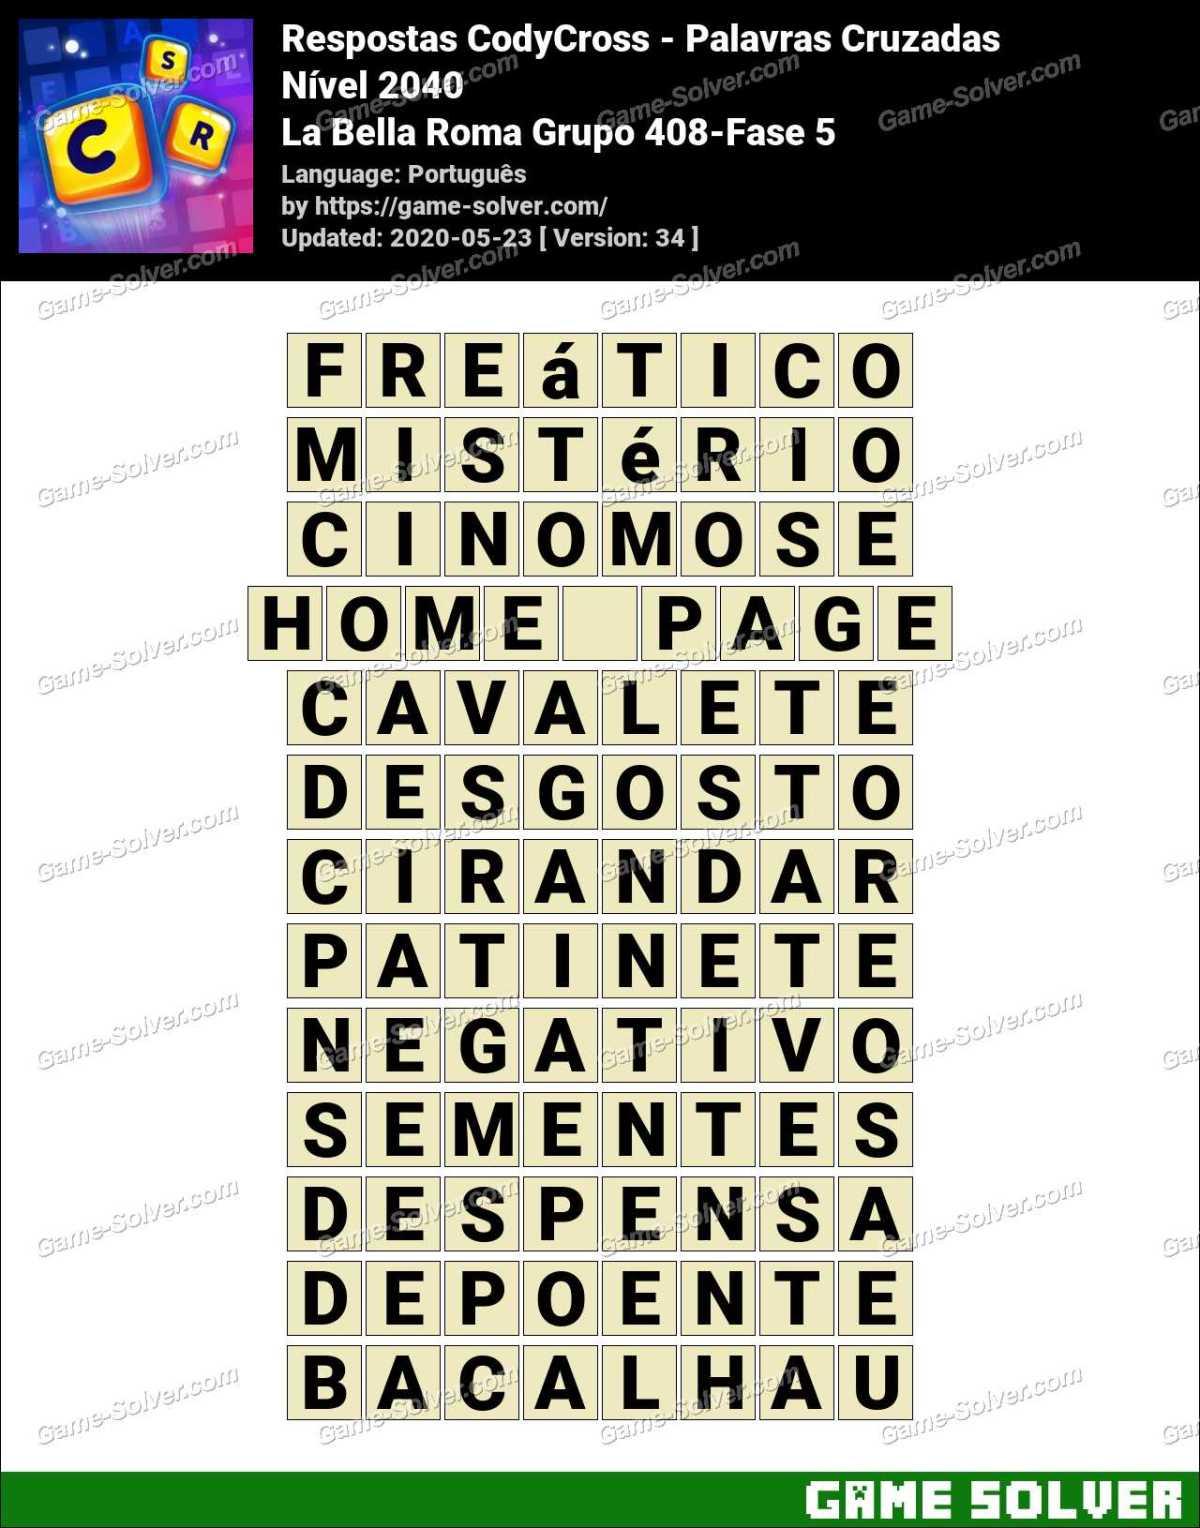 Respostas CodyCross La Bella Roma Grupo 408-Fase 5